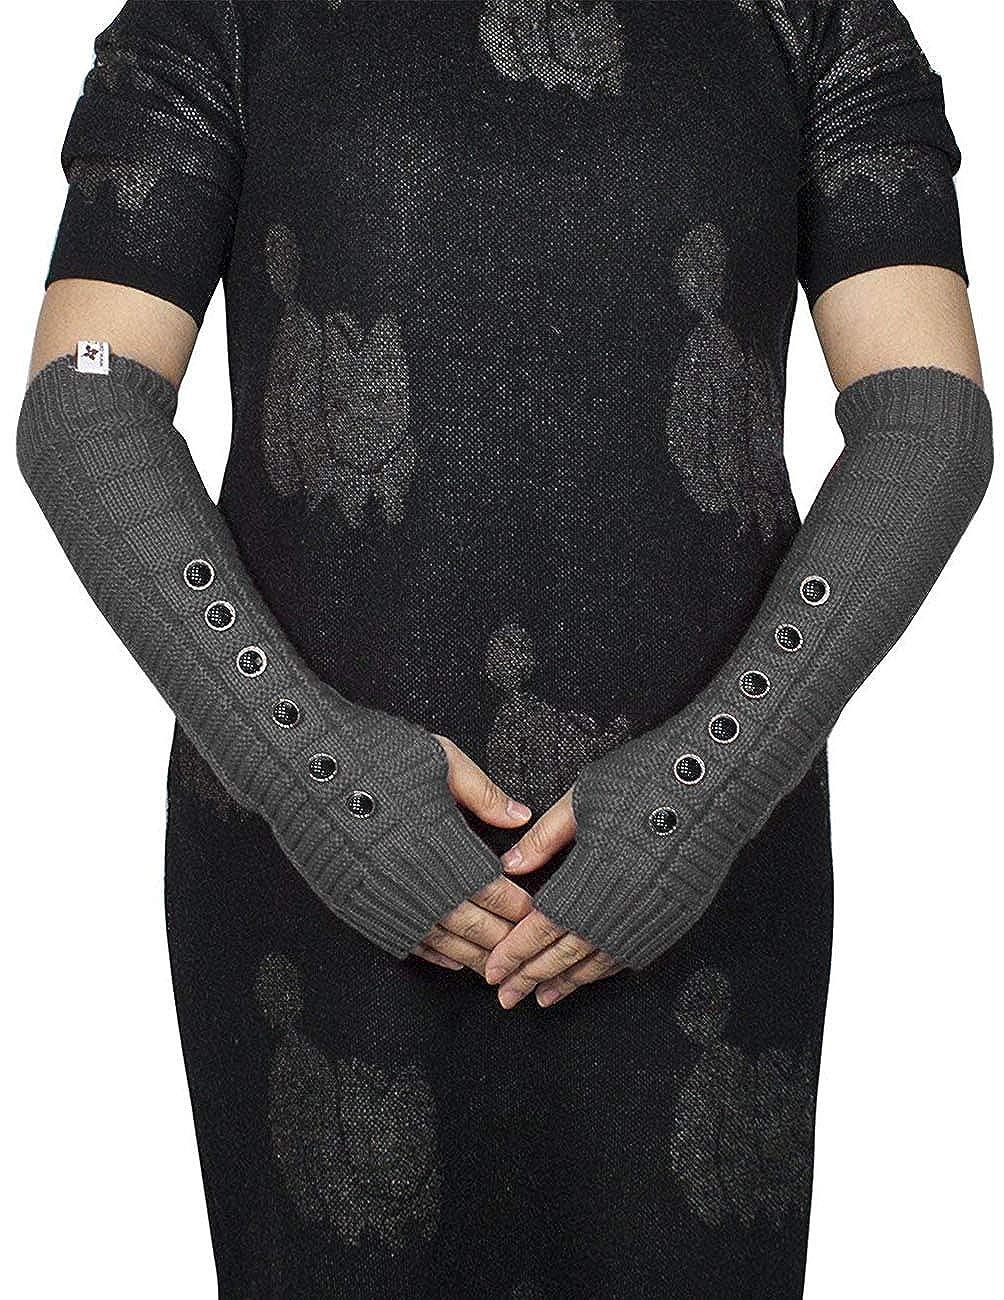 and Arm Warmers Hand /& Wrist Warmer Adjustable Dark Gray GL0028ACW-DG Dahlia Womens Knit Fingerless Gloves; Hand Wrist